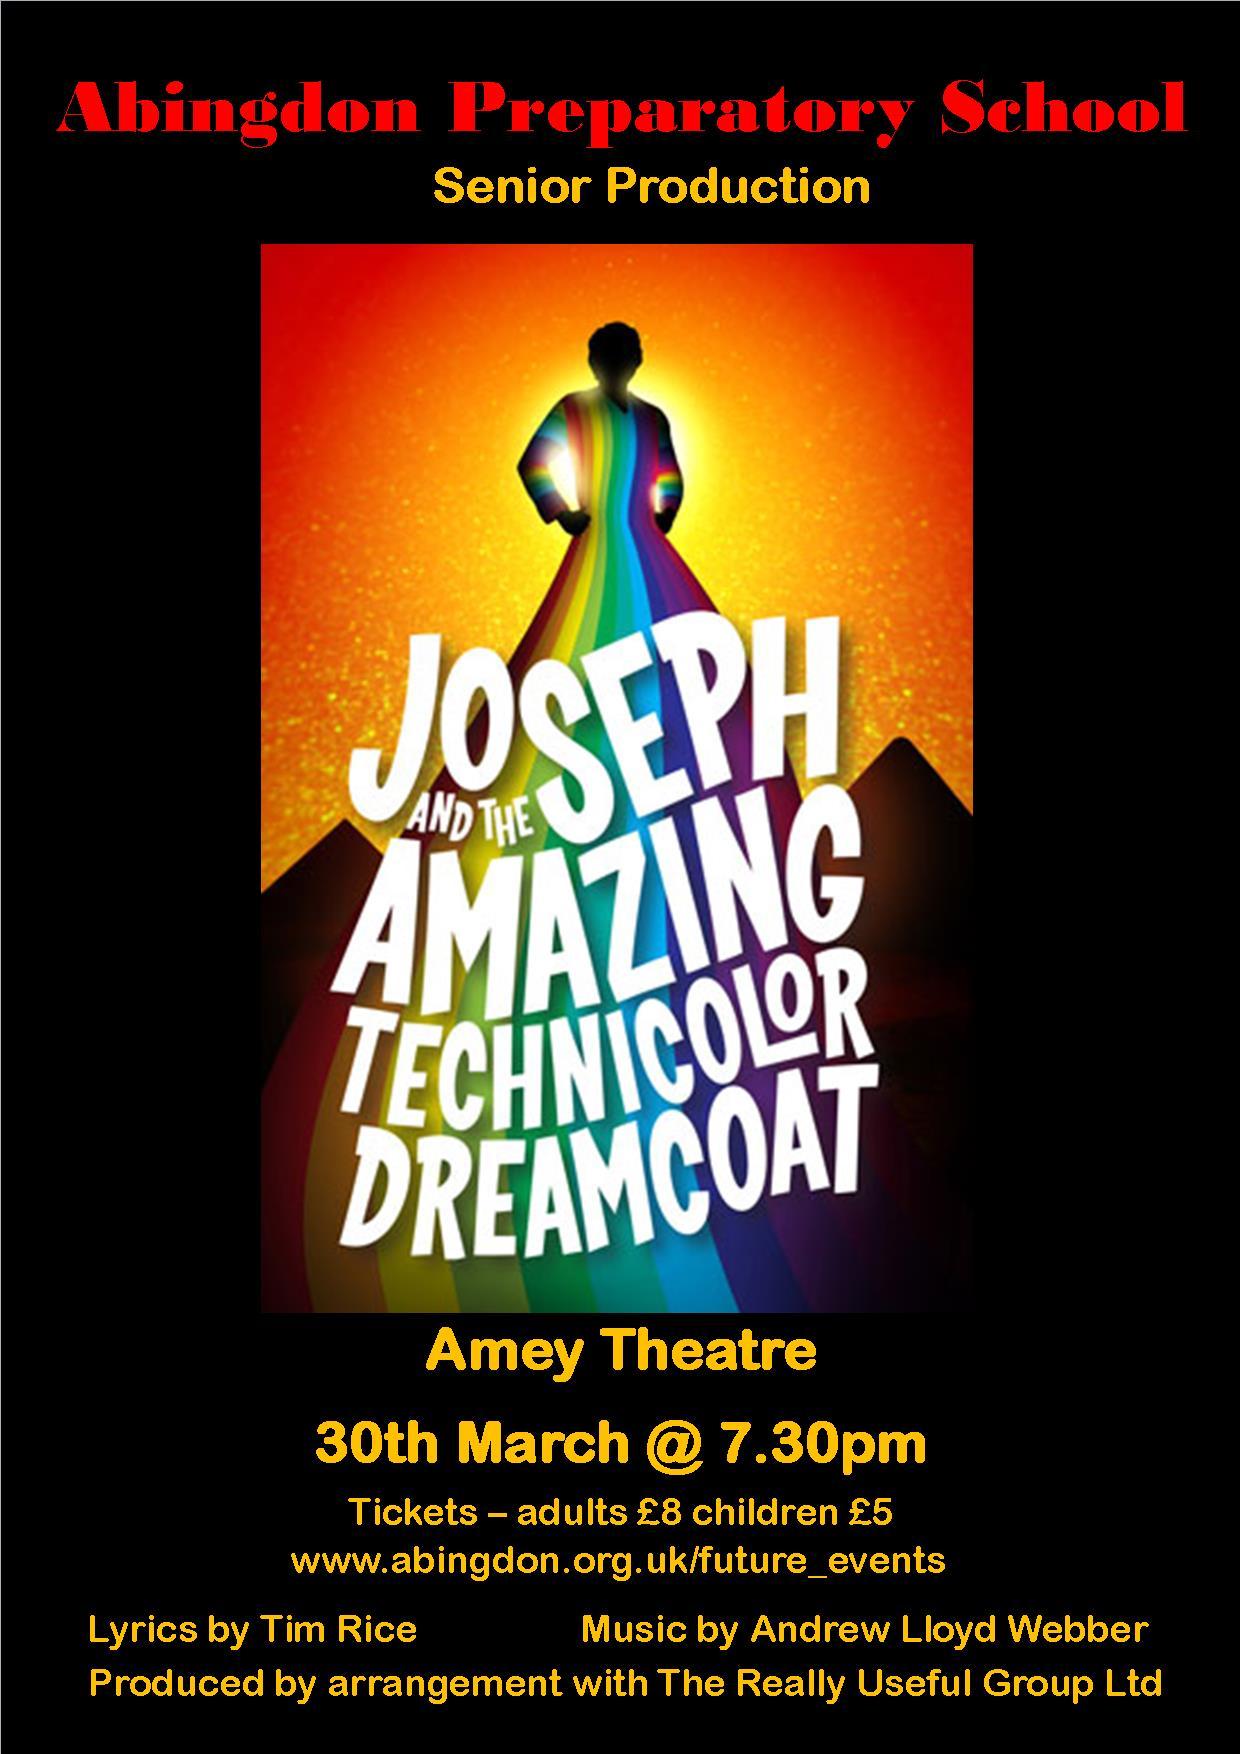 Abingdon Prep: Joseph and the Amazing Technicolor Dreamcoat